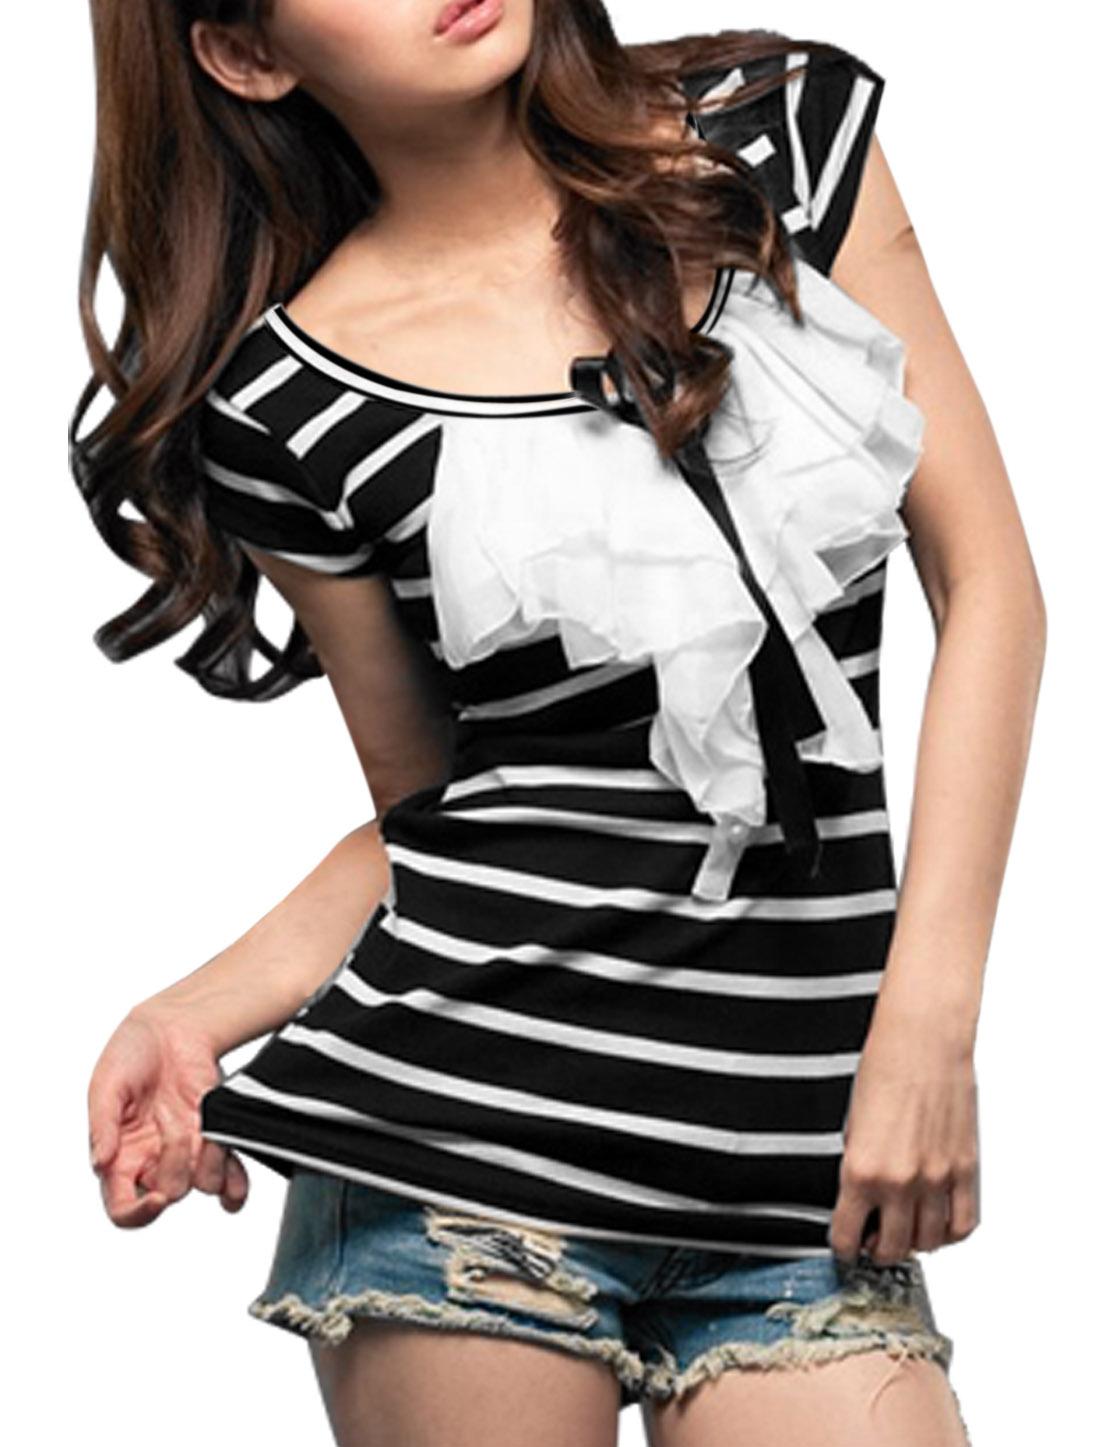 Women Chic Ruffles Decor Front Black White Striped Tee Shirt XL